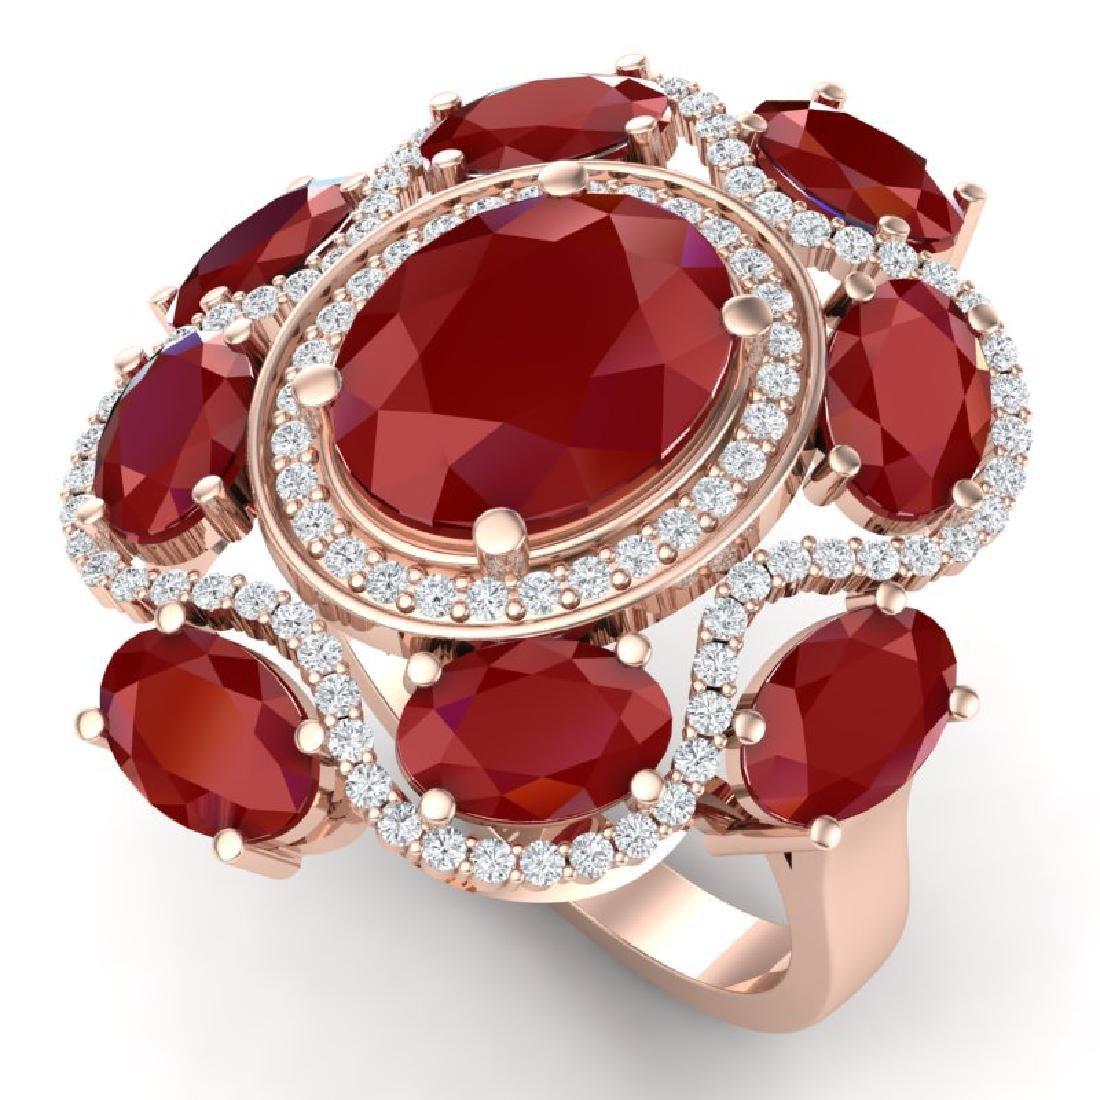 9.86 CTW Royalty Designer Ruby & VS Diamond Ring 18K